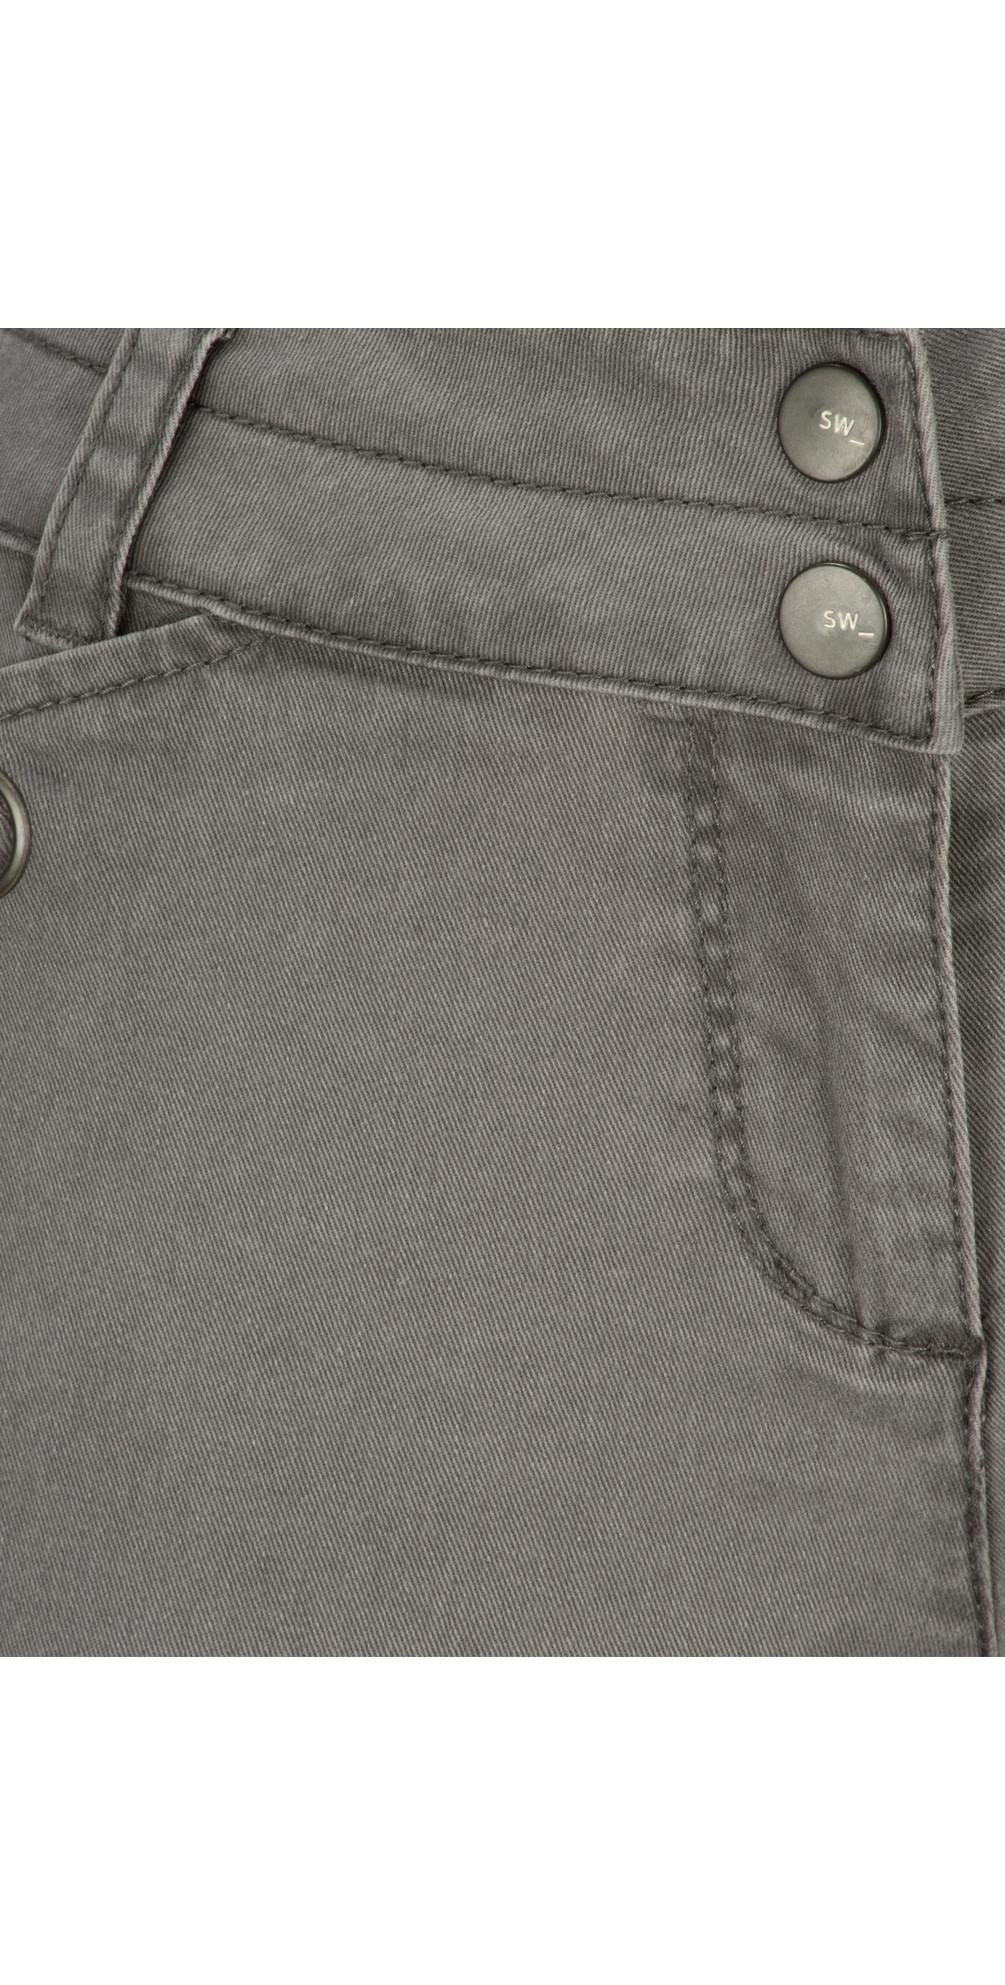 Stretch Twill Slim Fit Trouser main image